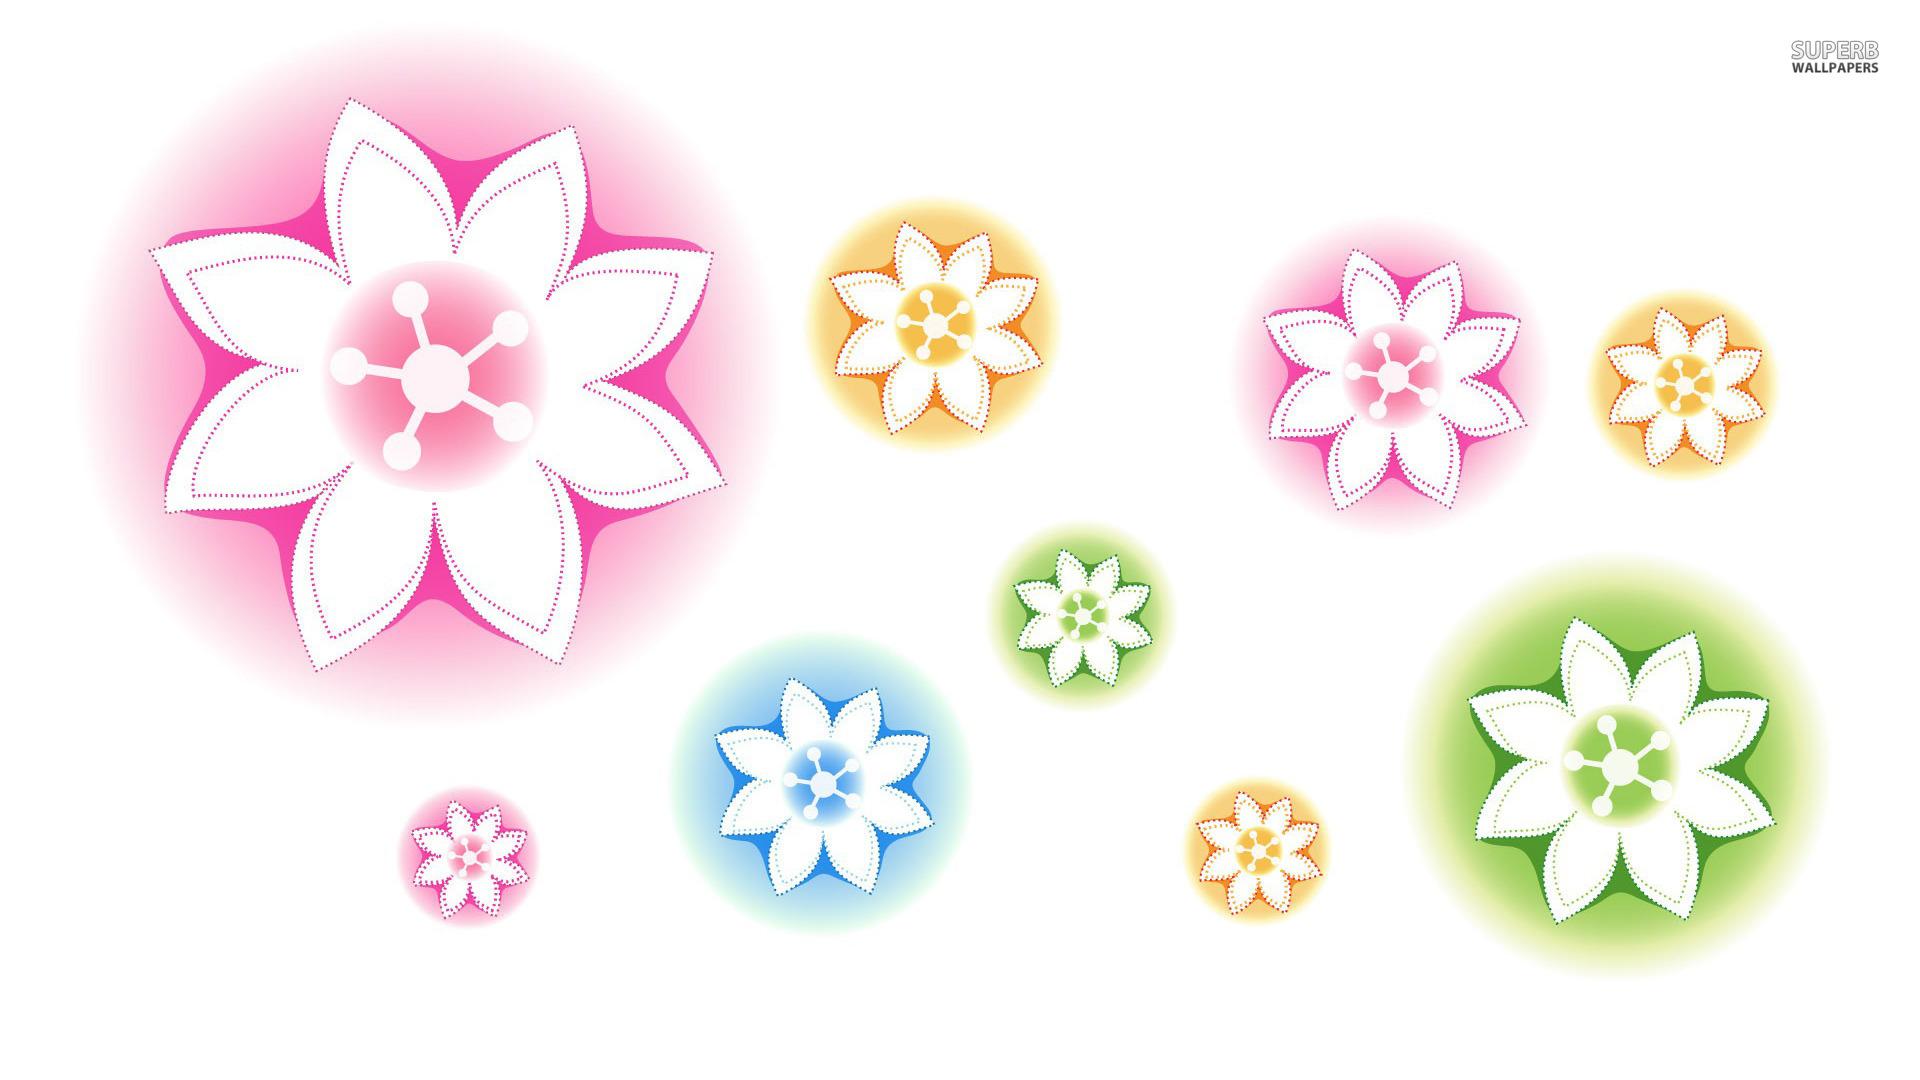 Neon flowers wallpaper 1920x1080